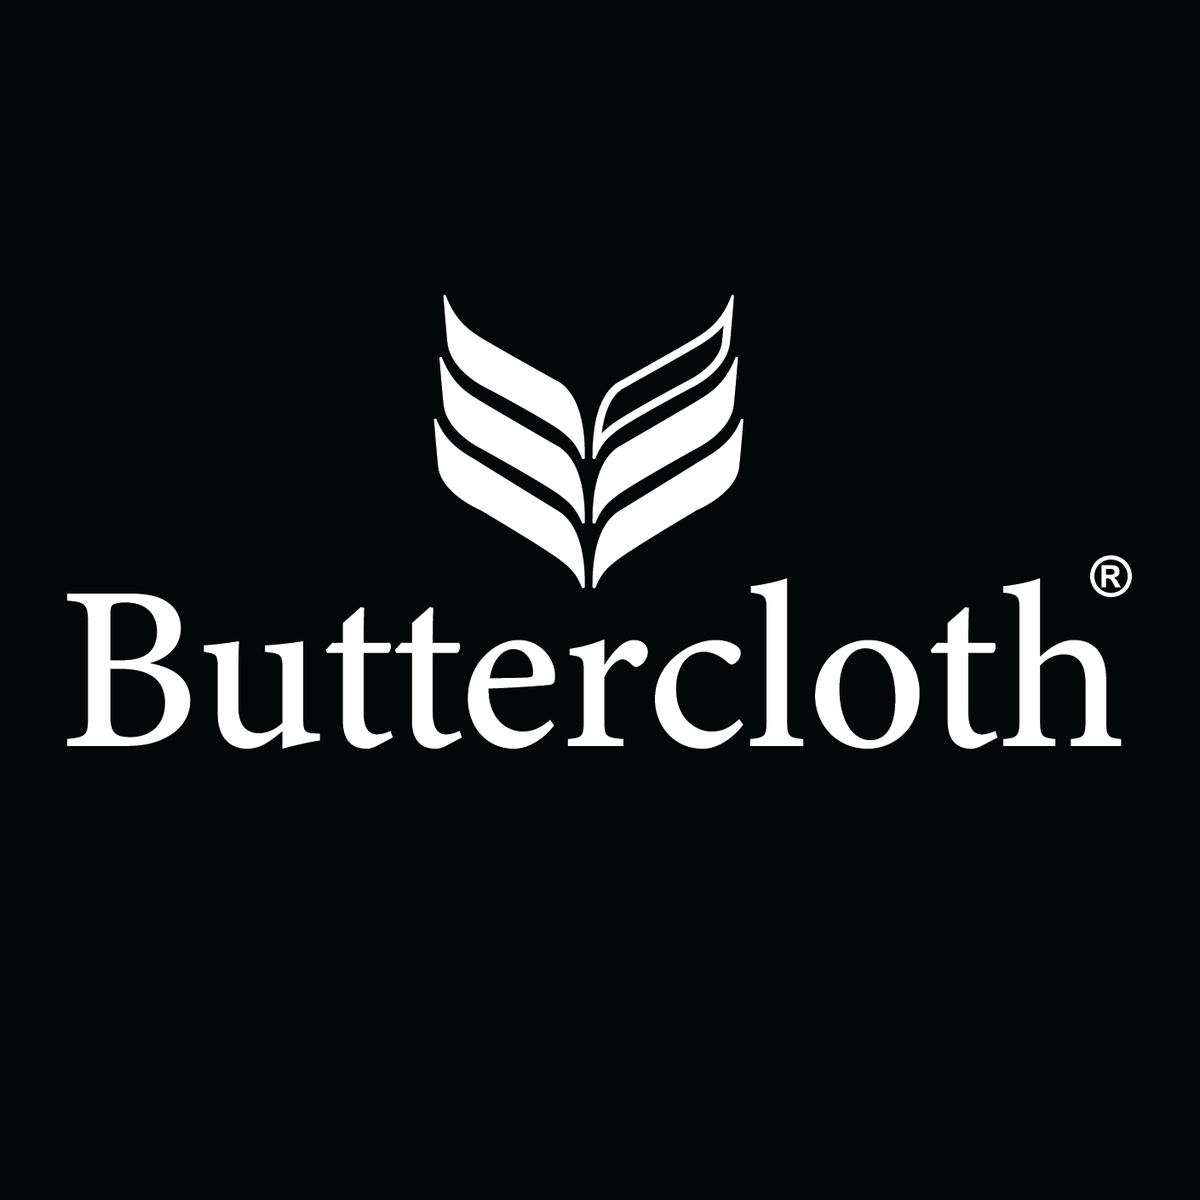 Buttercloth